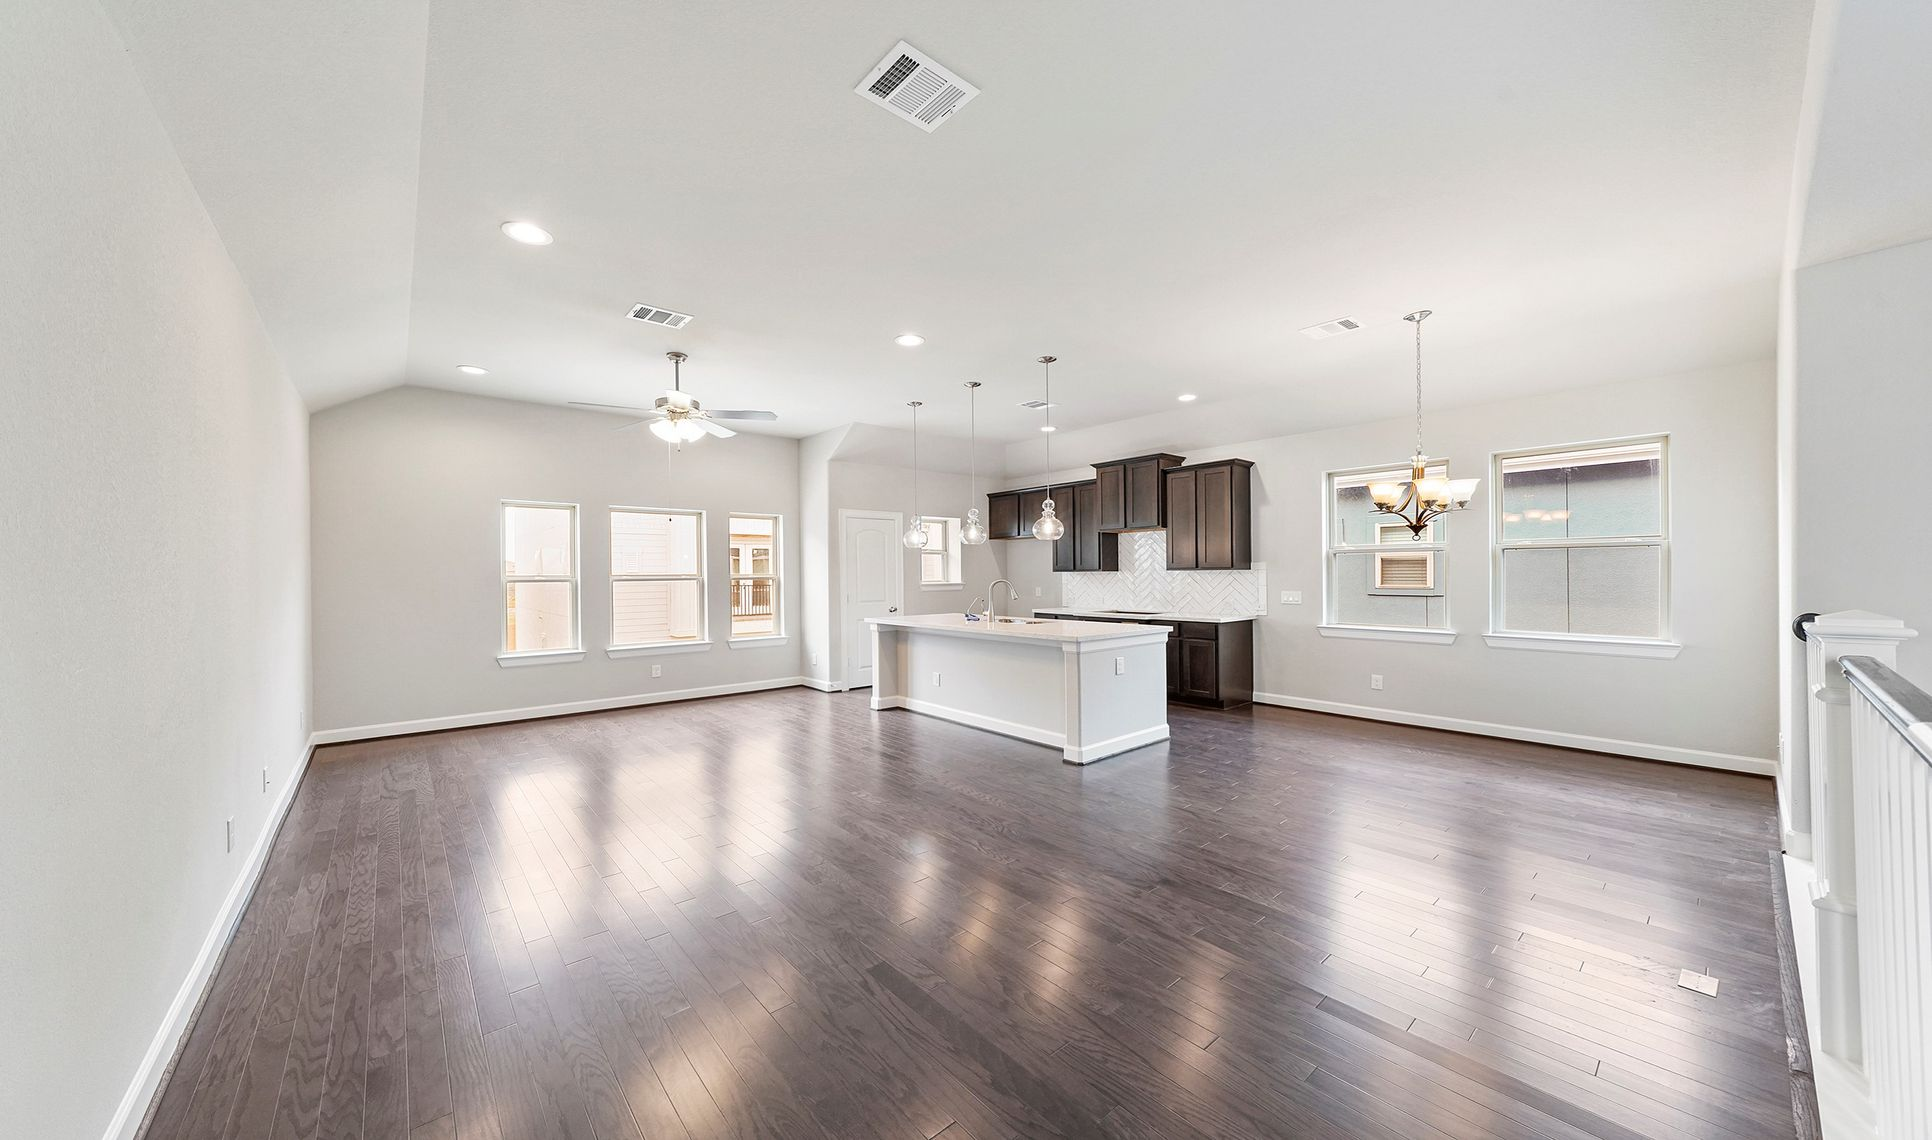 Interior:Bright open floorplan